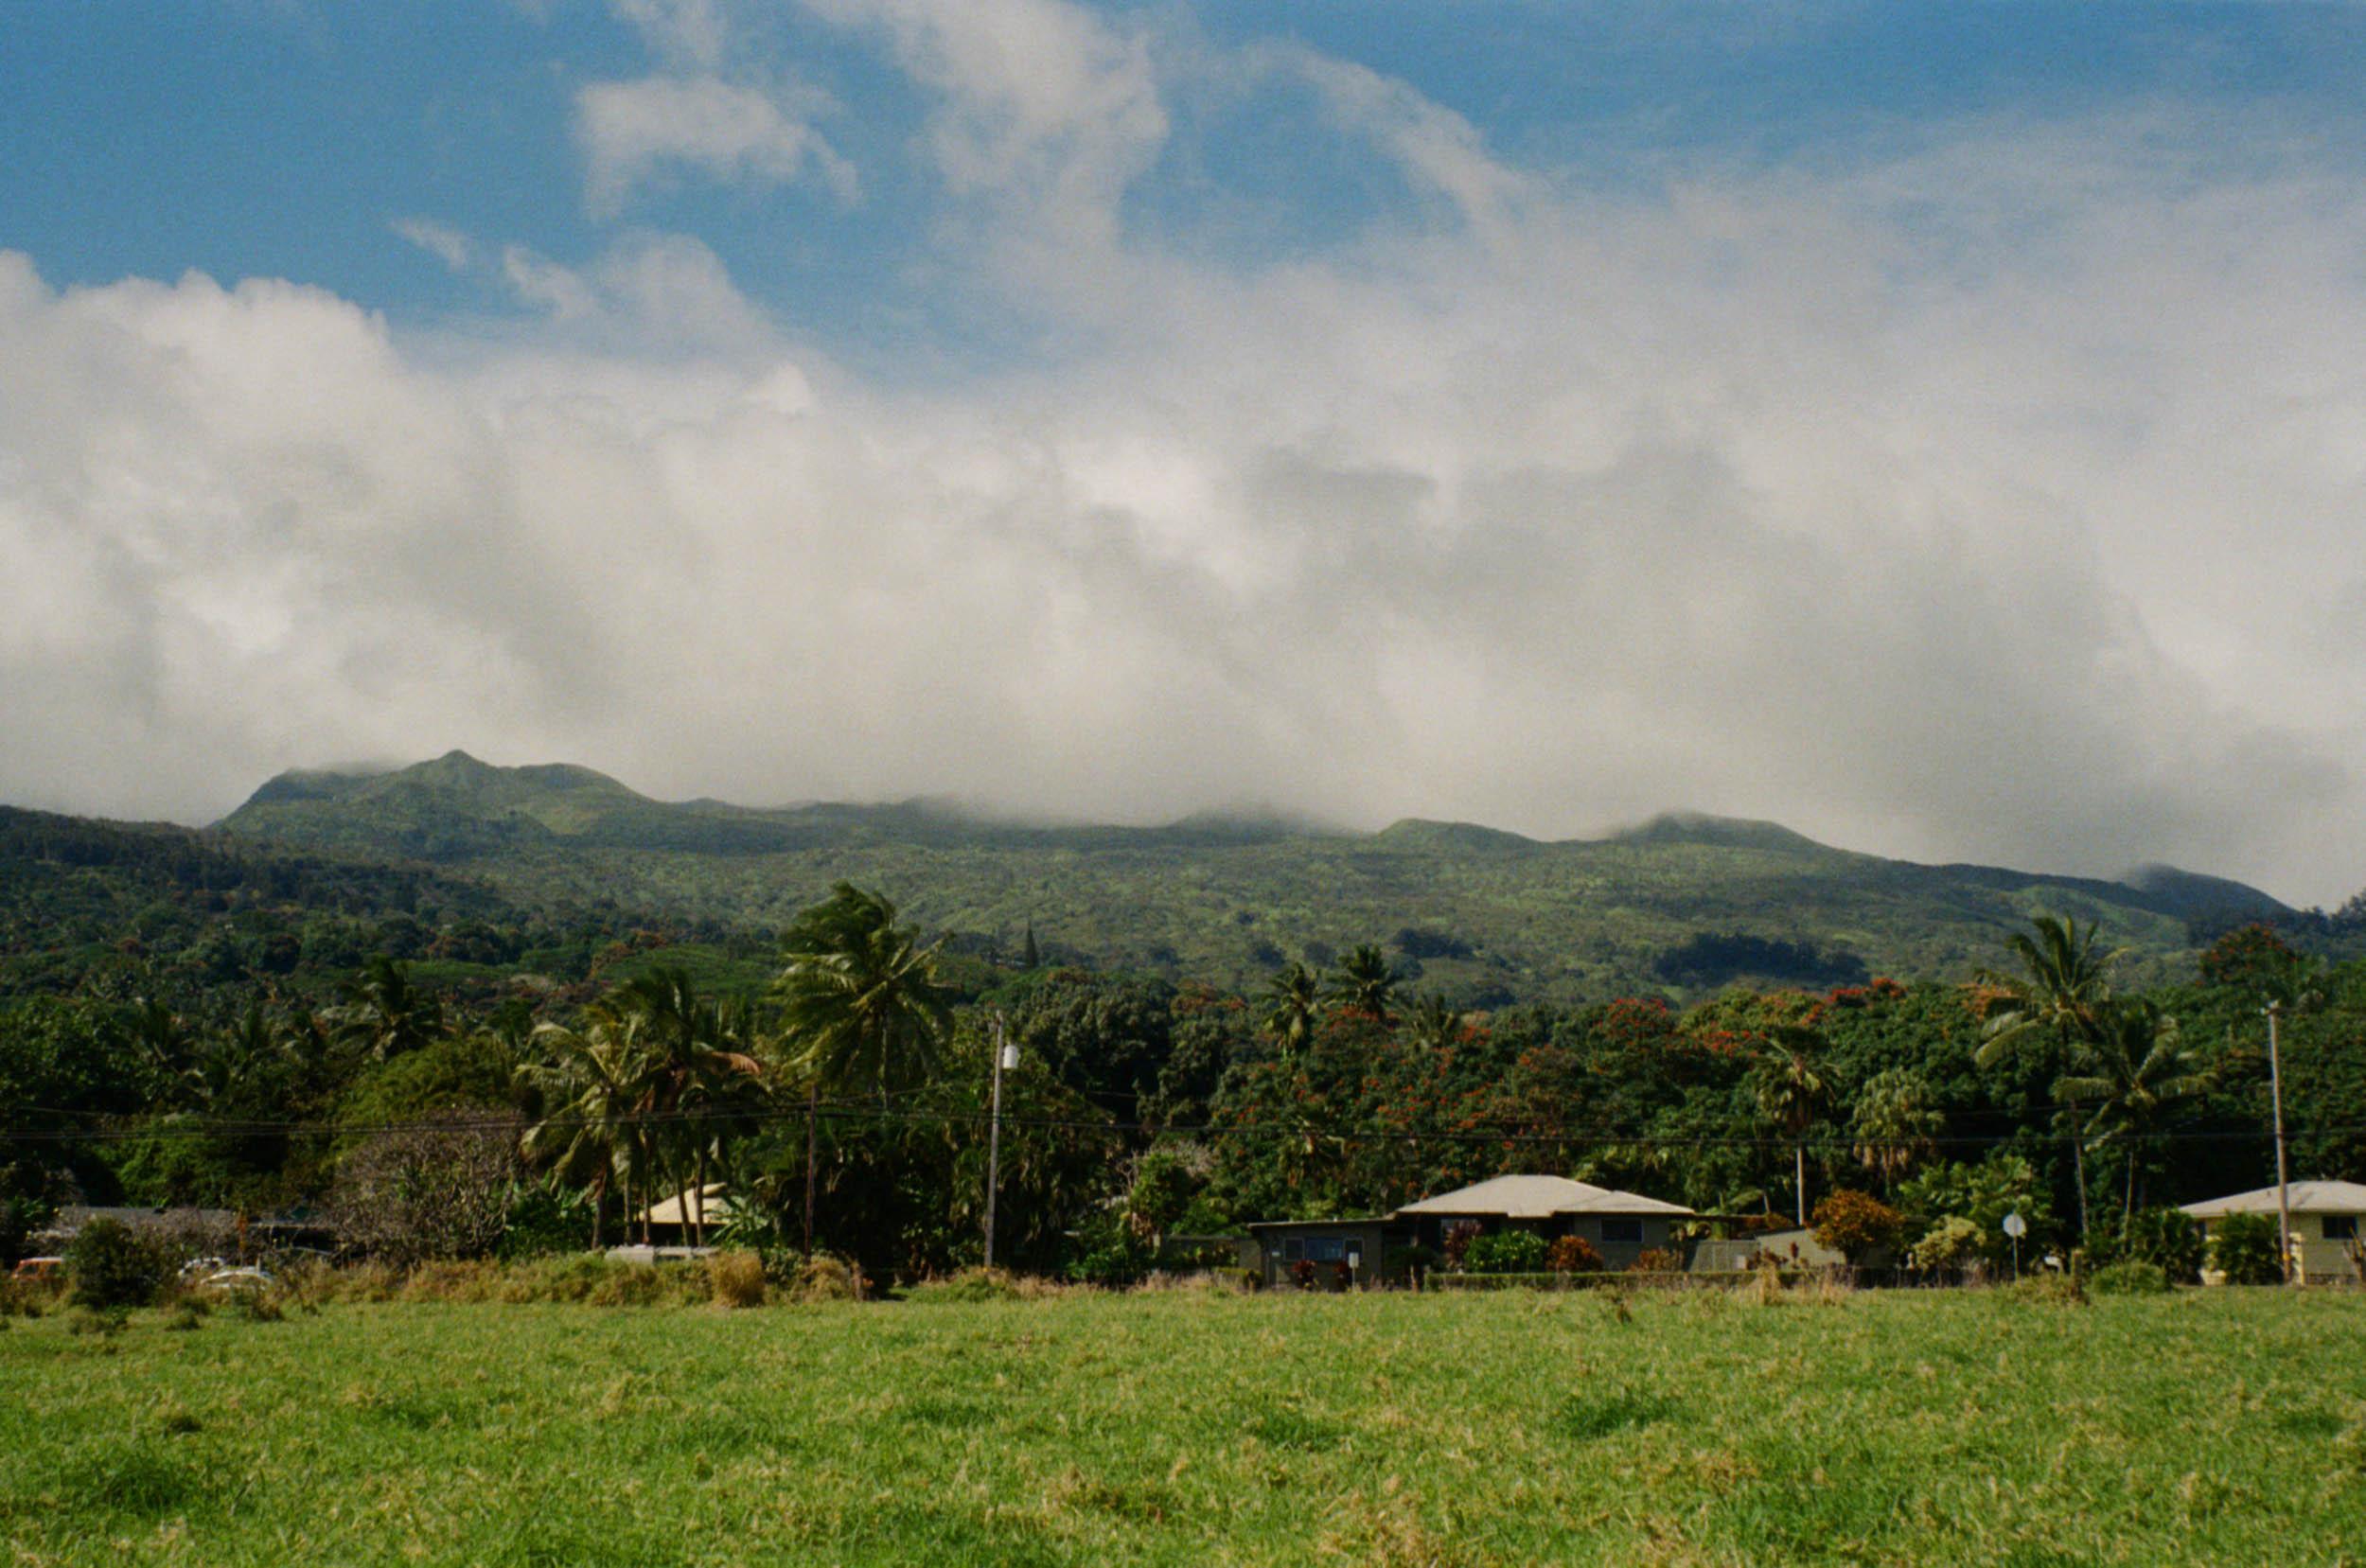 35mm_Maui-15.jpg